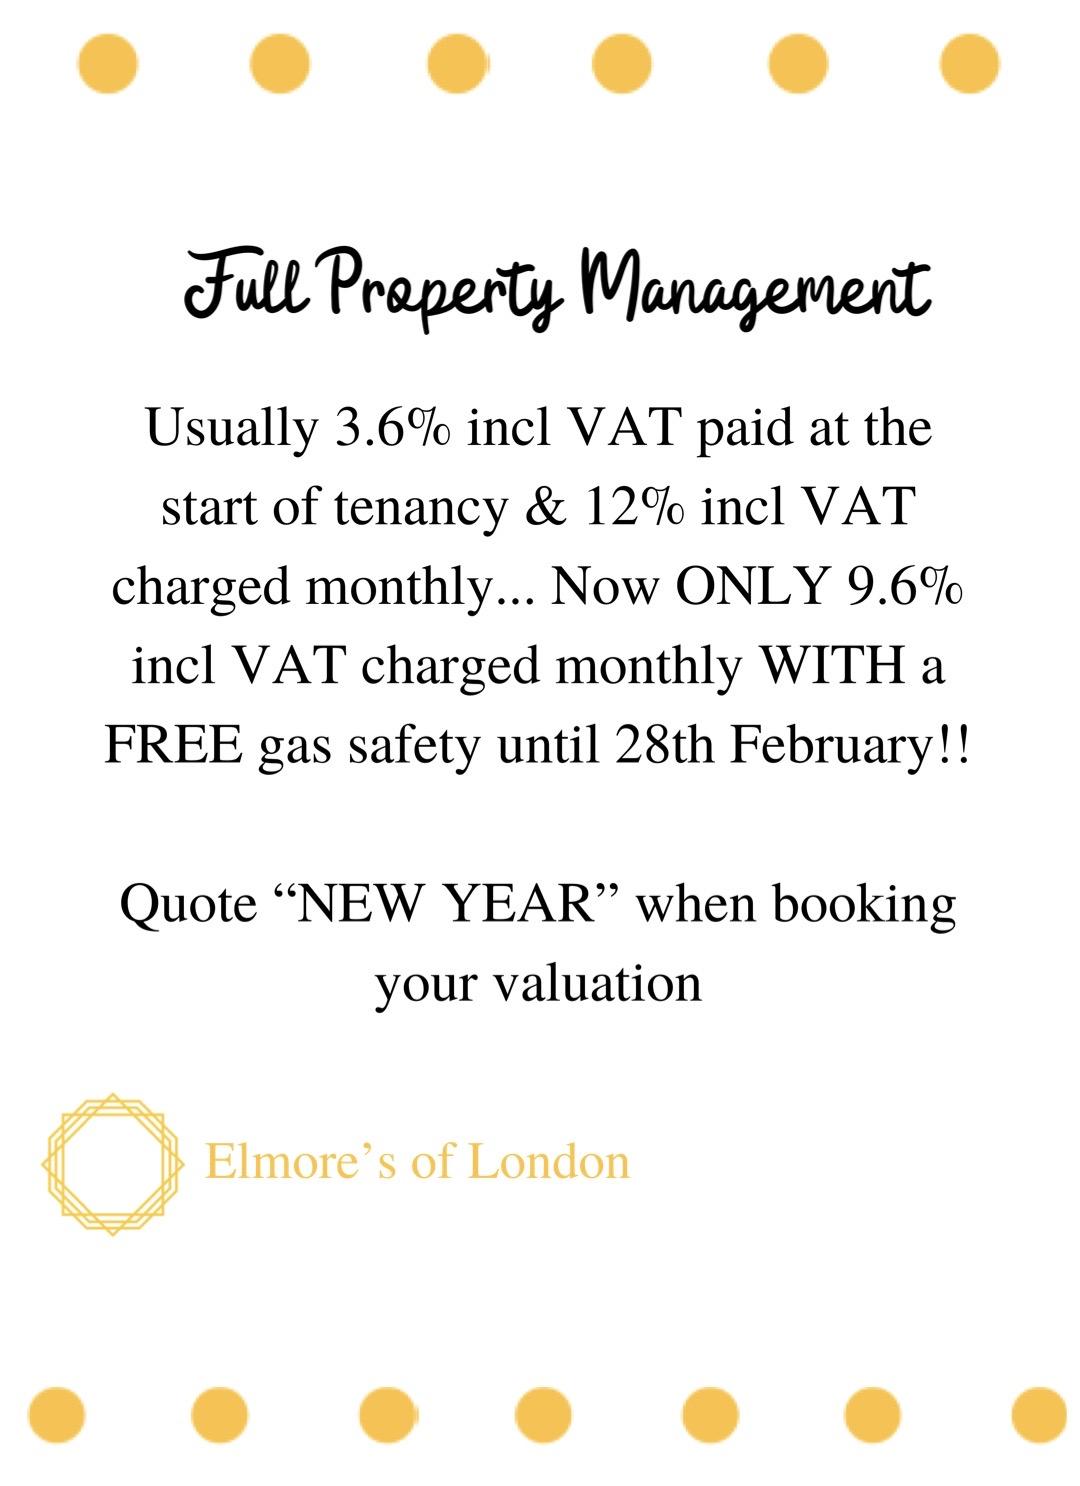 Elmore's of London landlord offers full property management